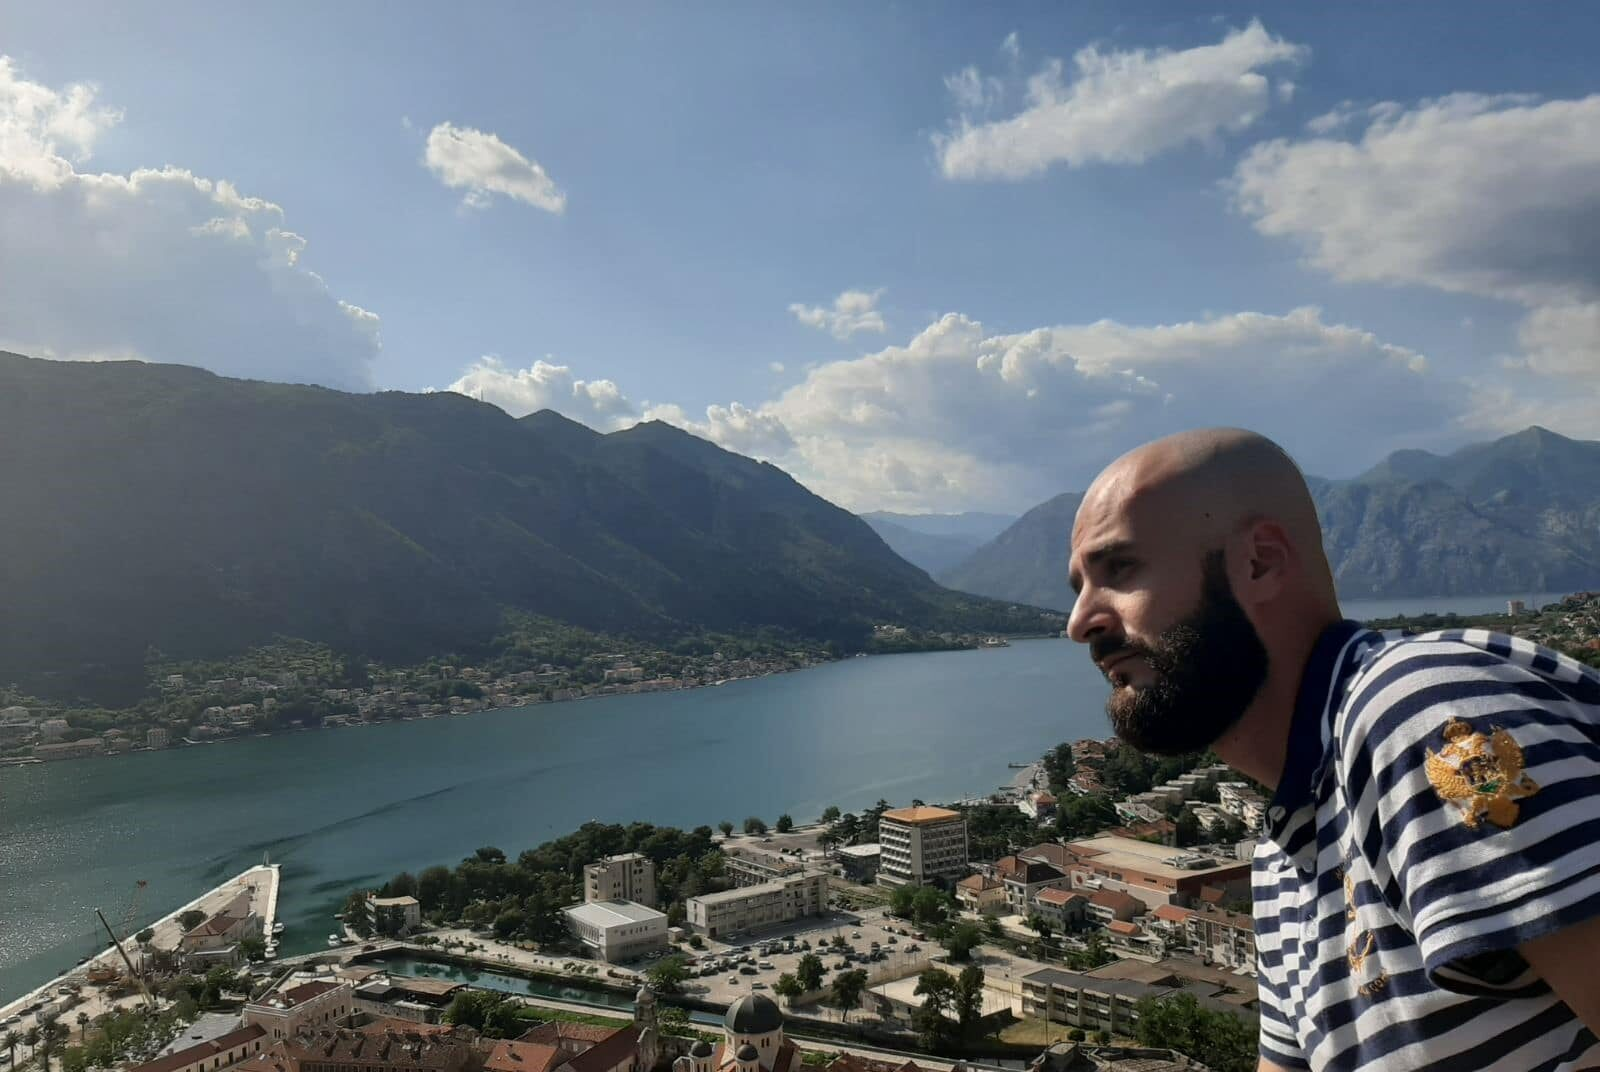 untravelled-paths-ilija-montenegro-someone-different